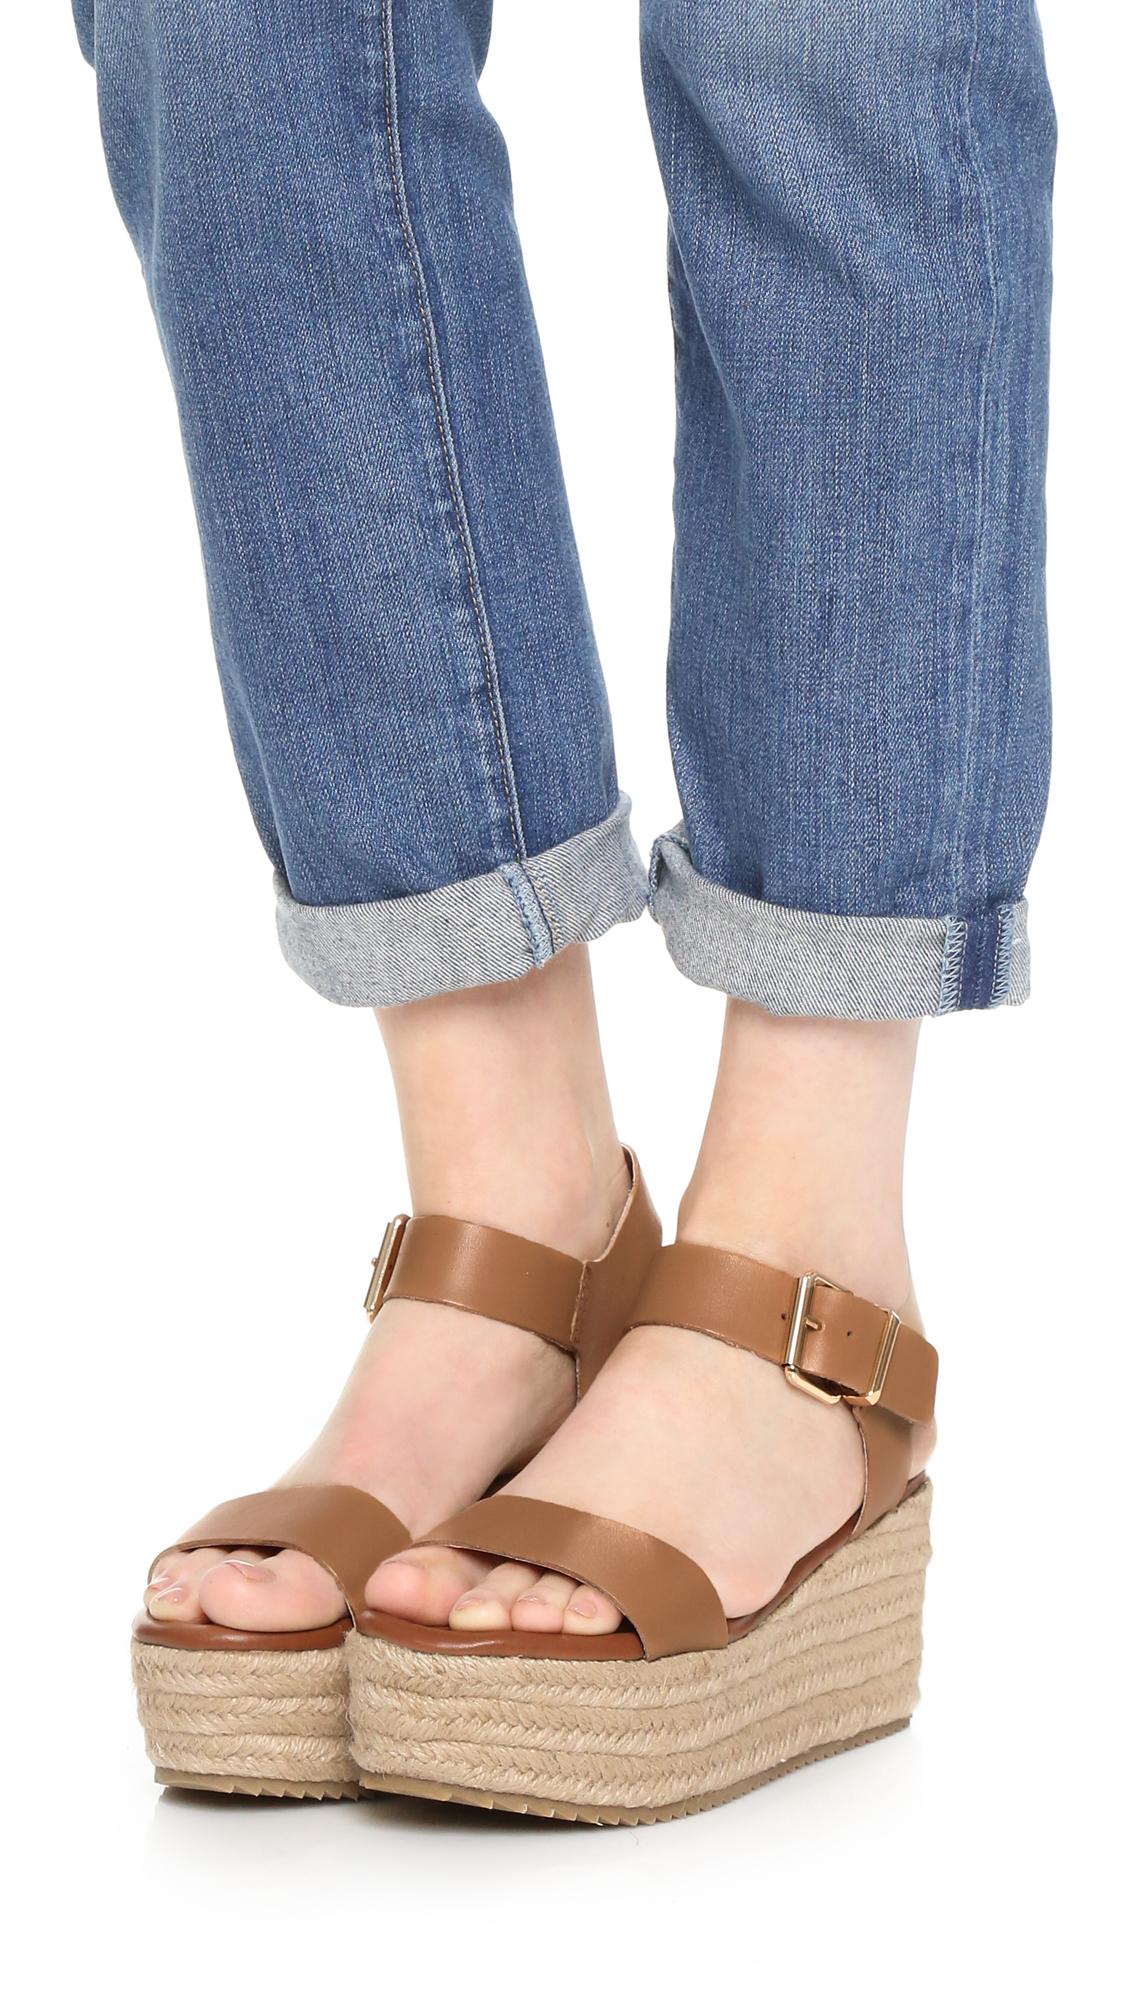 Lyst Steven By Steve Madden Sabbie Flatform Sandals In Brown